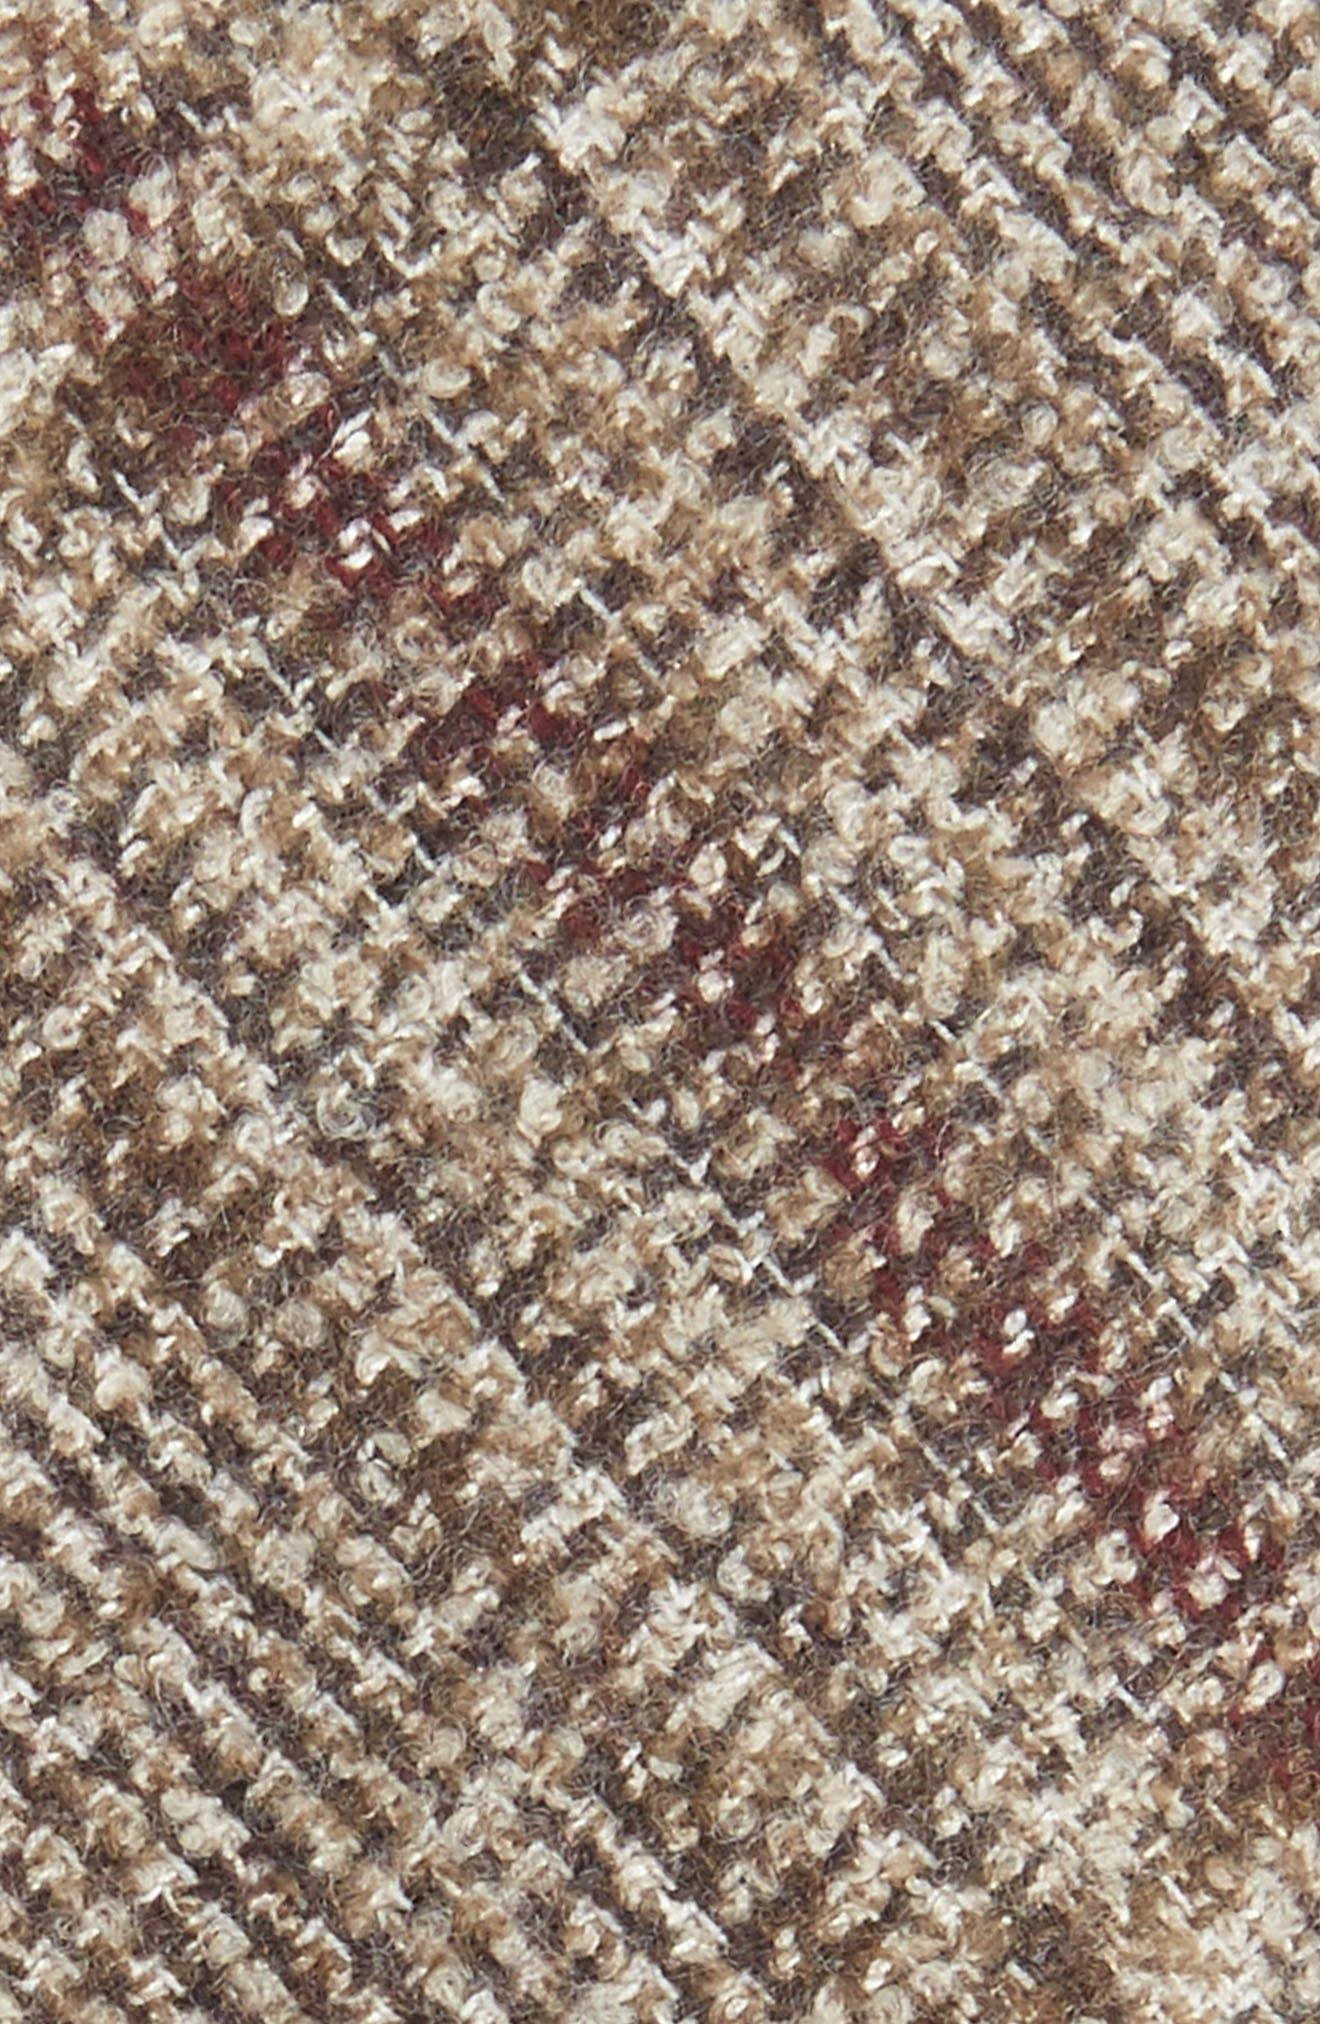 Glencheck Wool Blend Skinny Tie,                             Alternate thumbnail 2, color,                             255